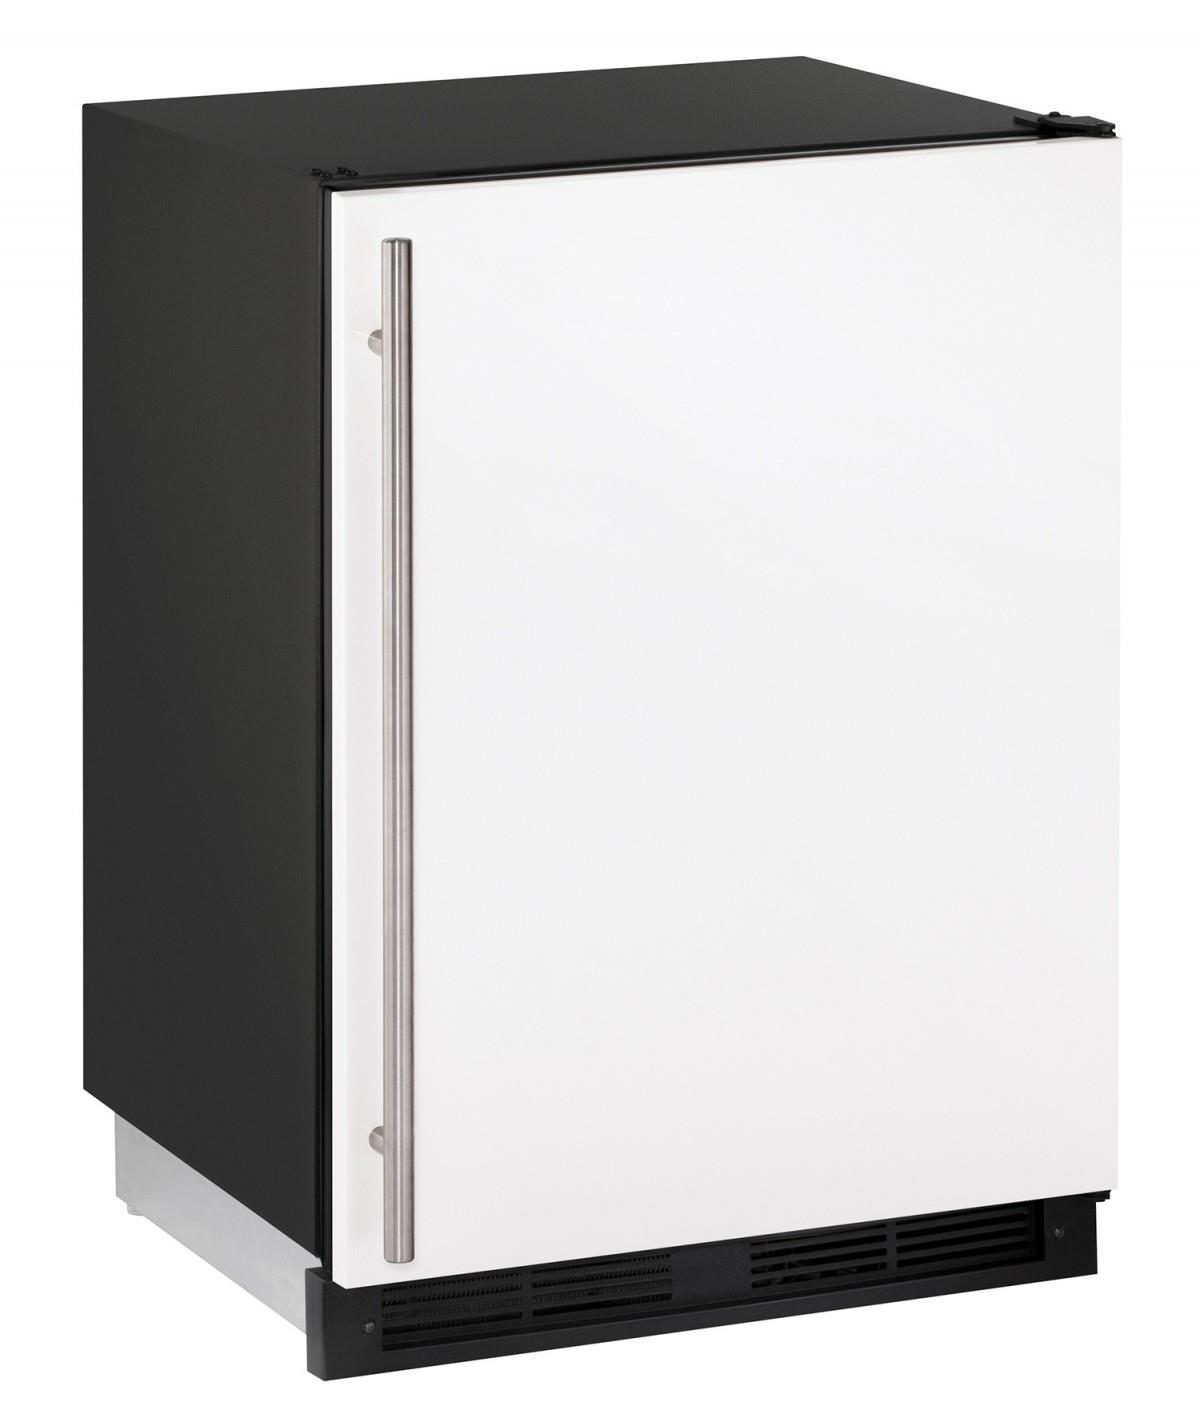 U-Line Refrigerators 4.2 cu. ft. Built-in Refrigerator/Freezer - Item Number: U-CO1224FW-00A